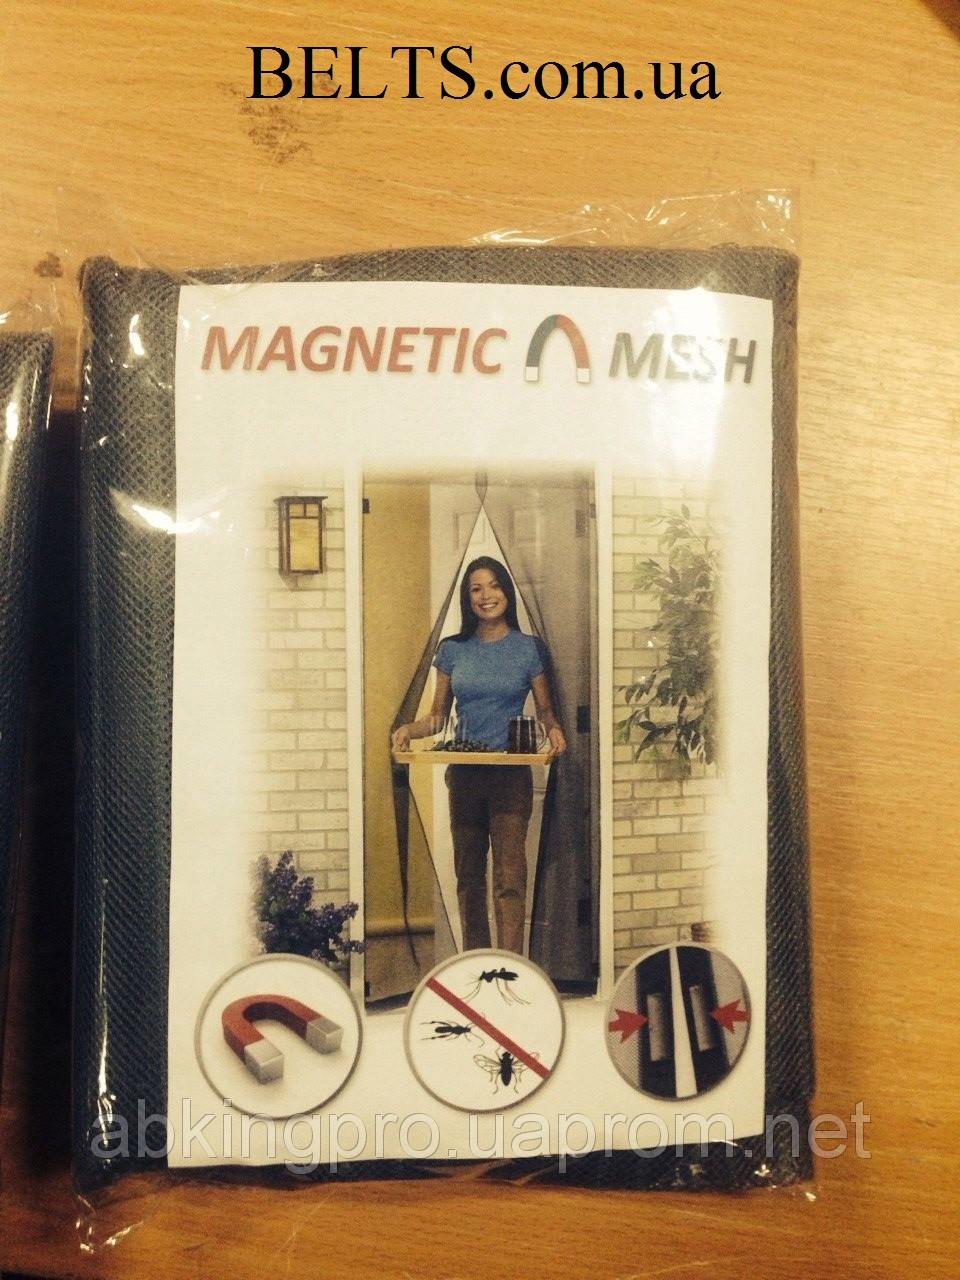 Дверна антимоскітна сітка на магнітах Magnetic Mesh, велика (210*100см.)